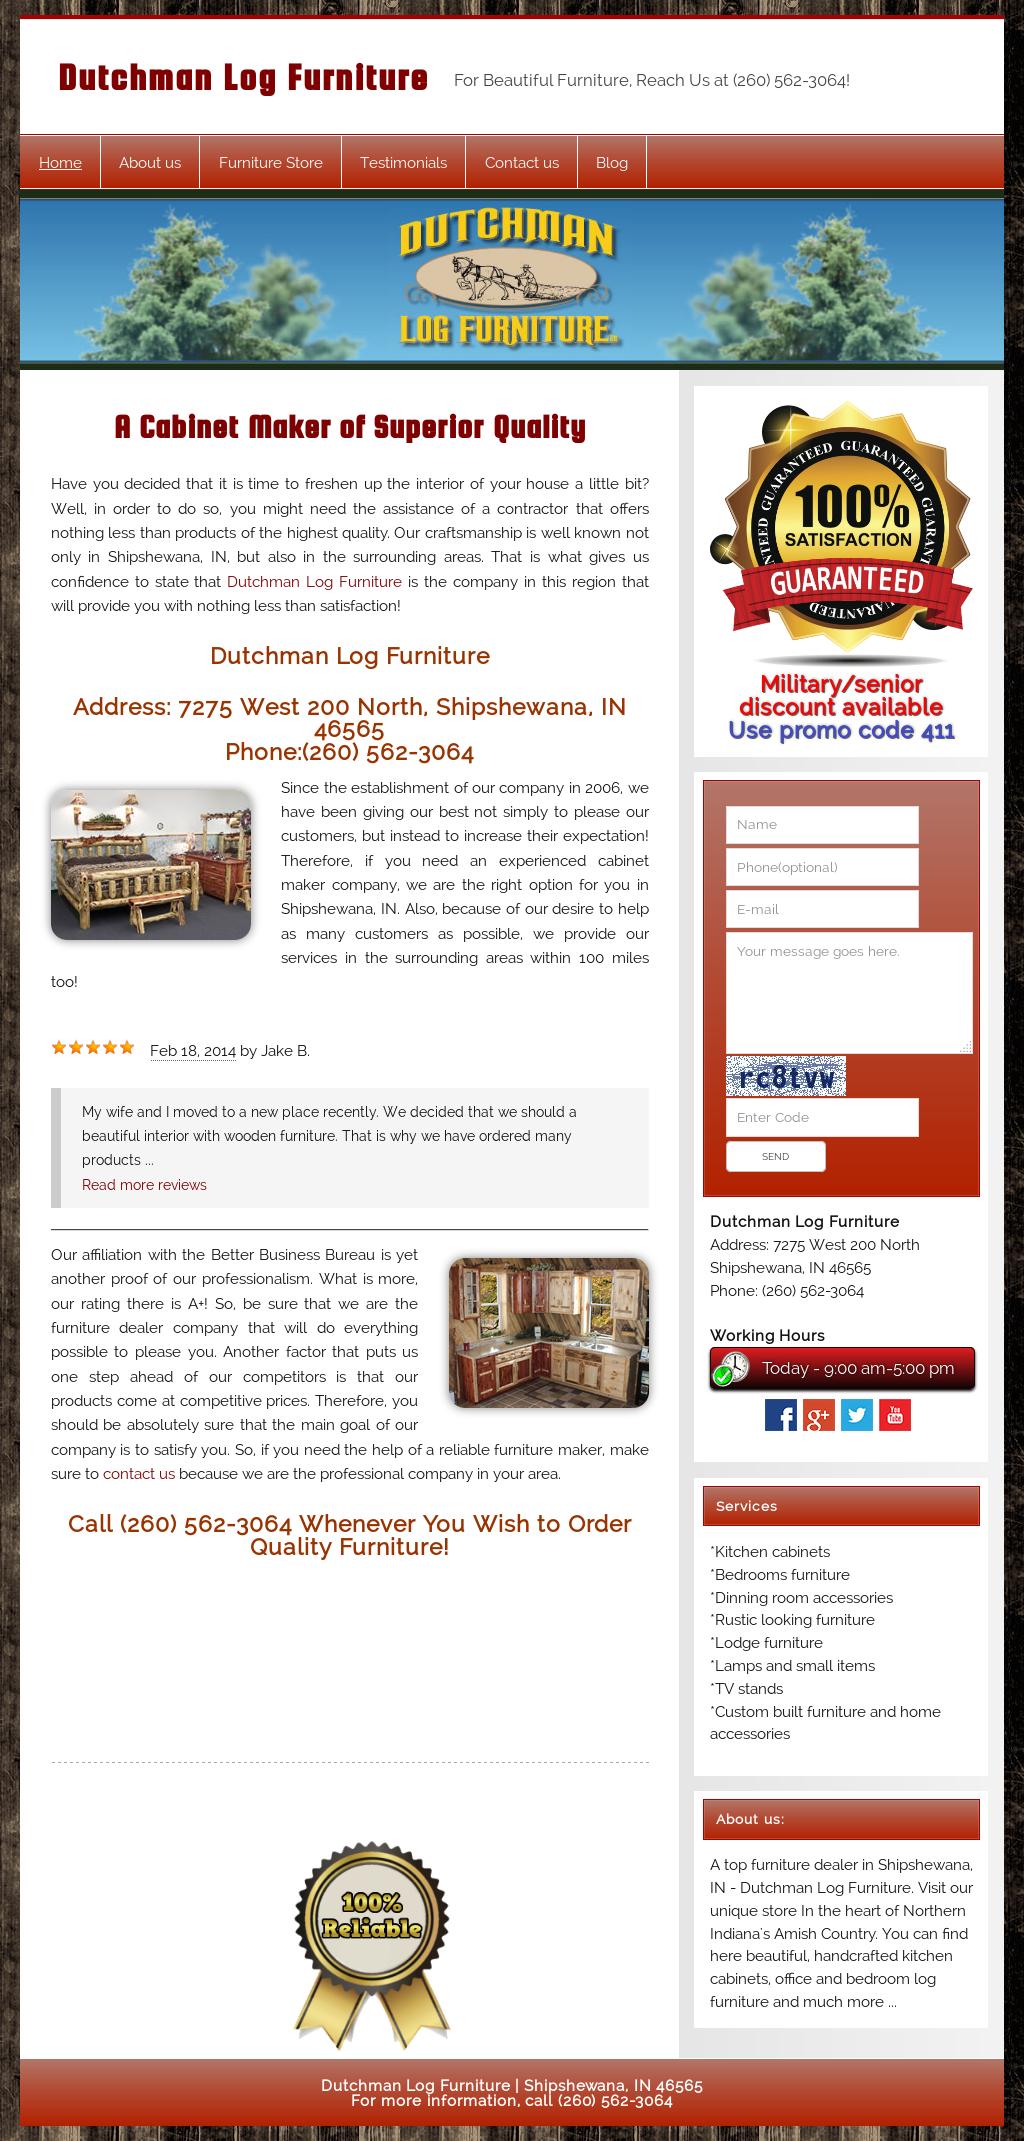 Dutchman Log Furniture Website History